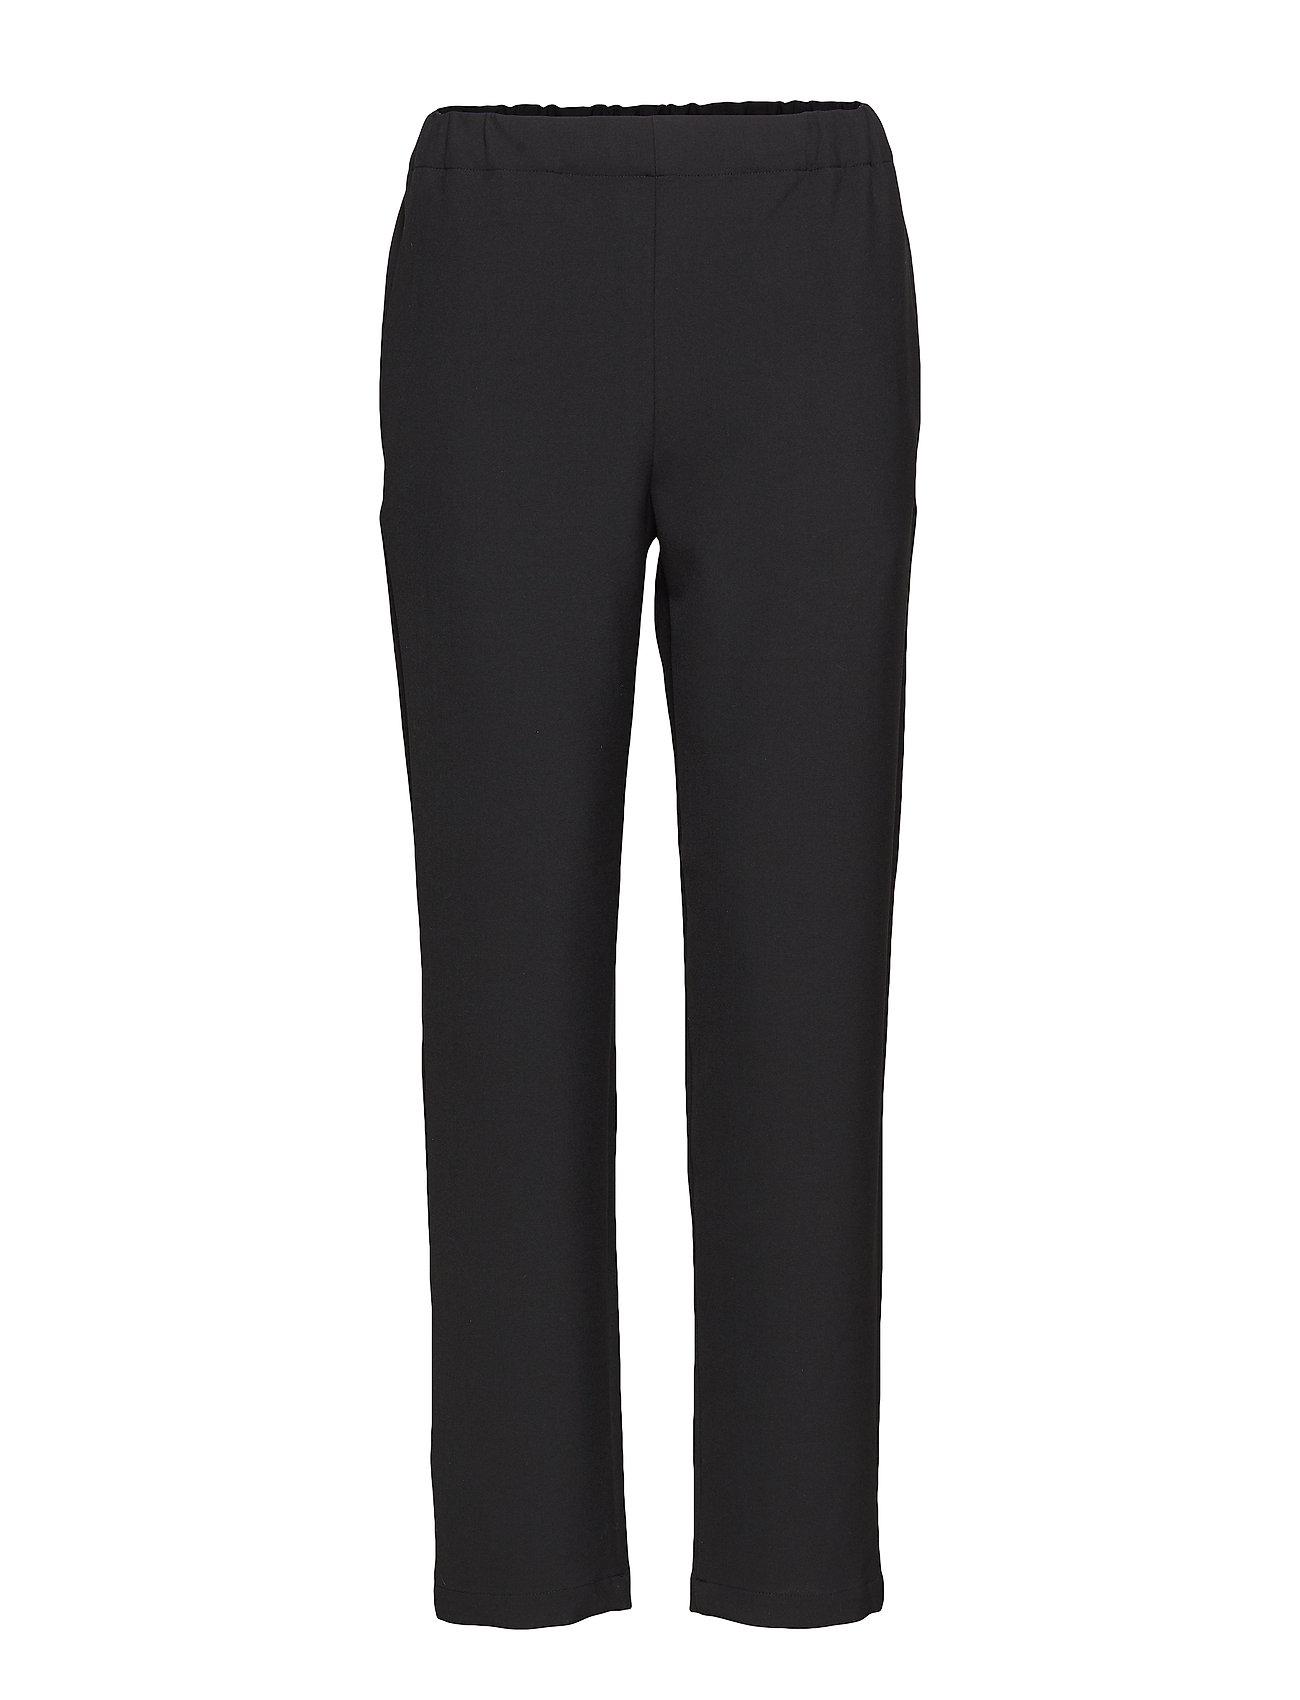 Marimekko ELENA LONG SOLID Trousers Byxor